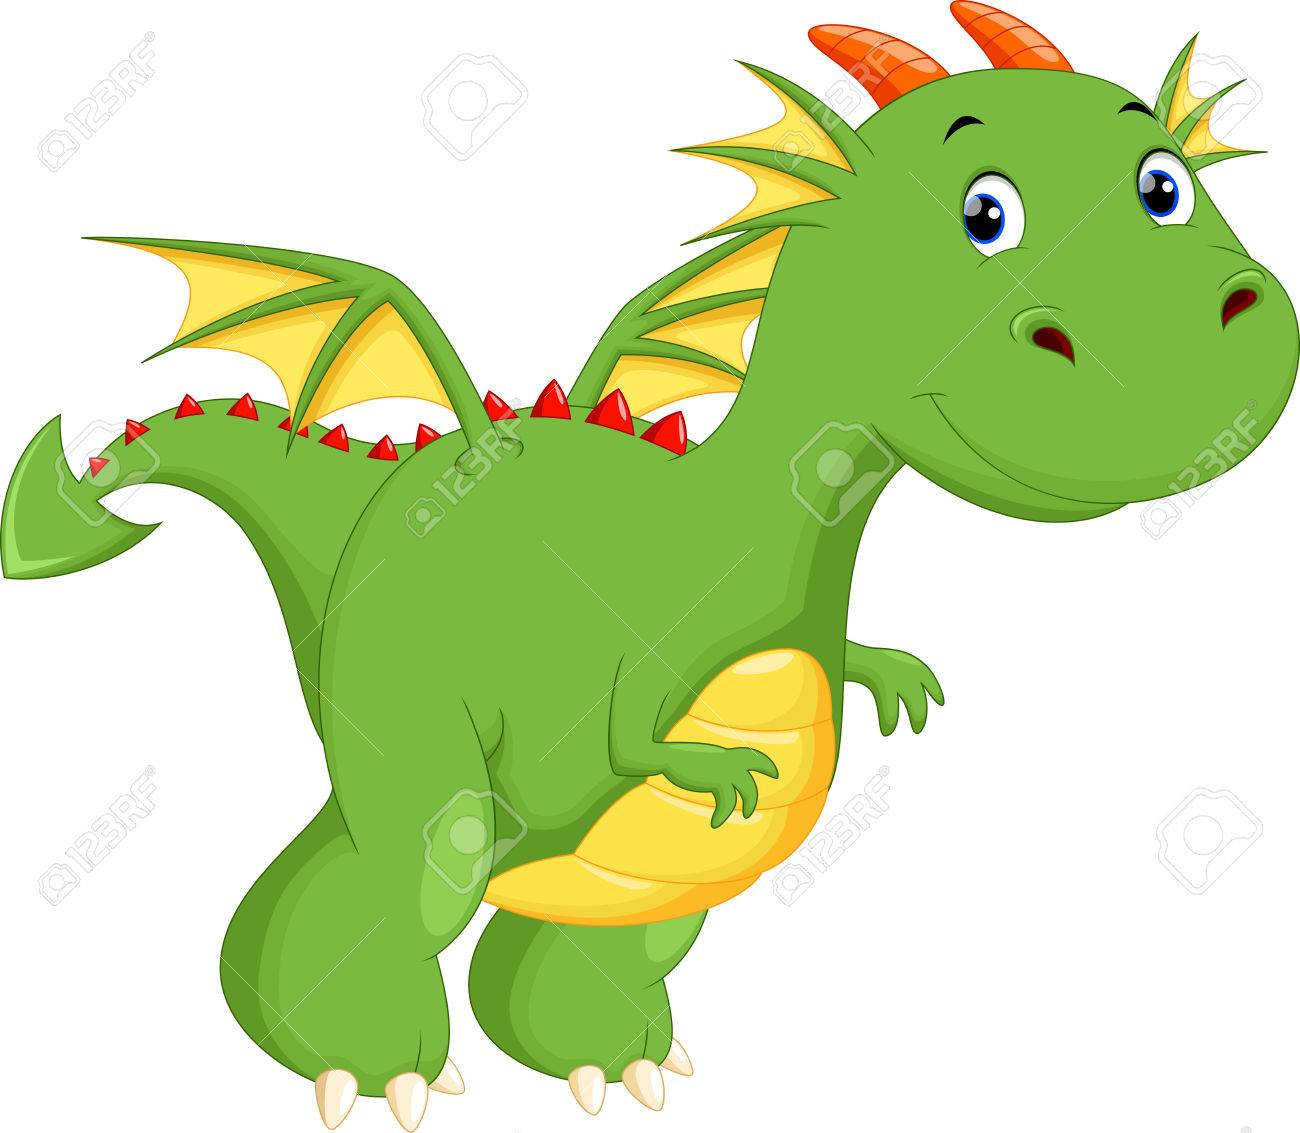 Funny Dragon Cartoon Royalty Free Cliparts, Vectors, And Stock ...